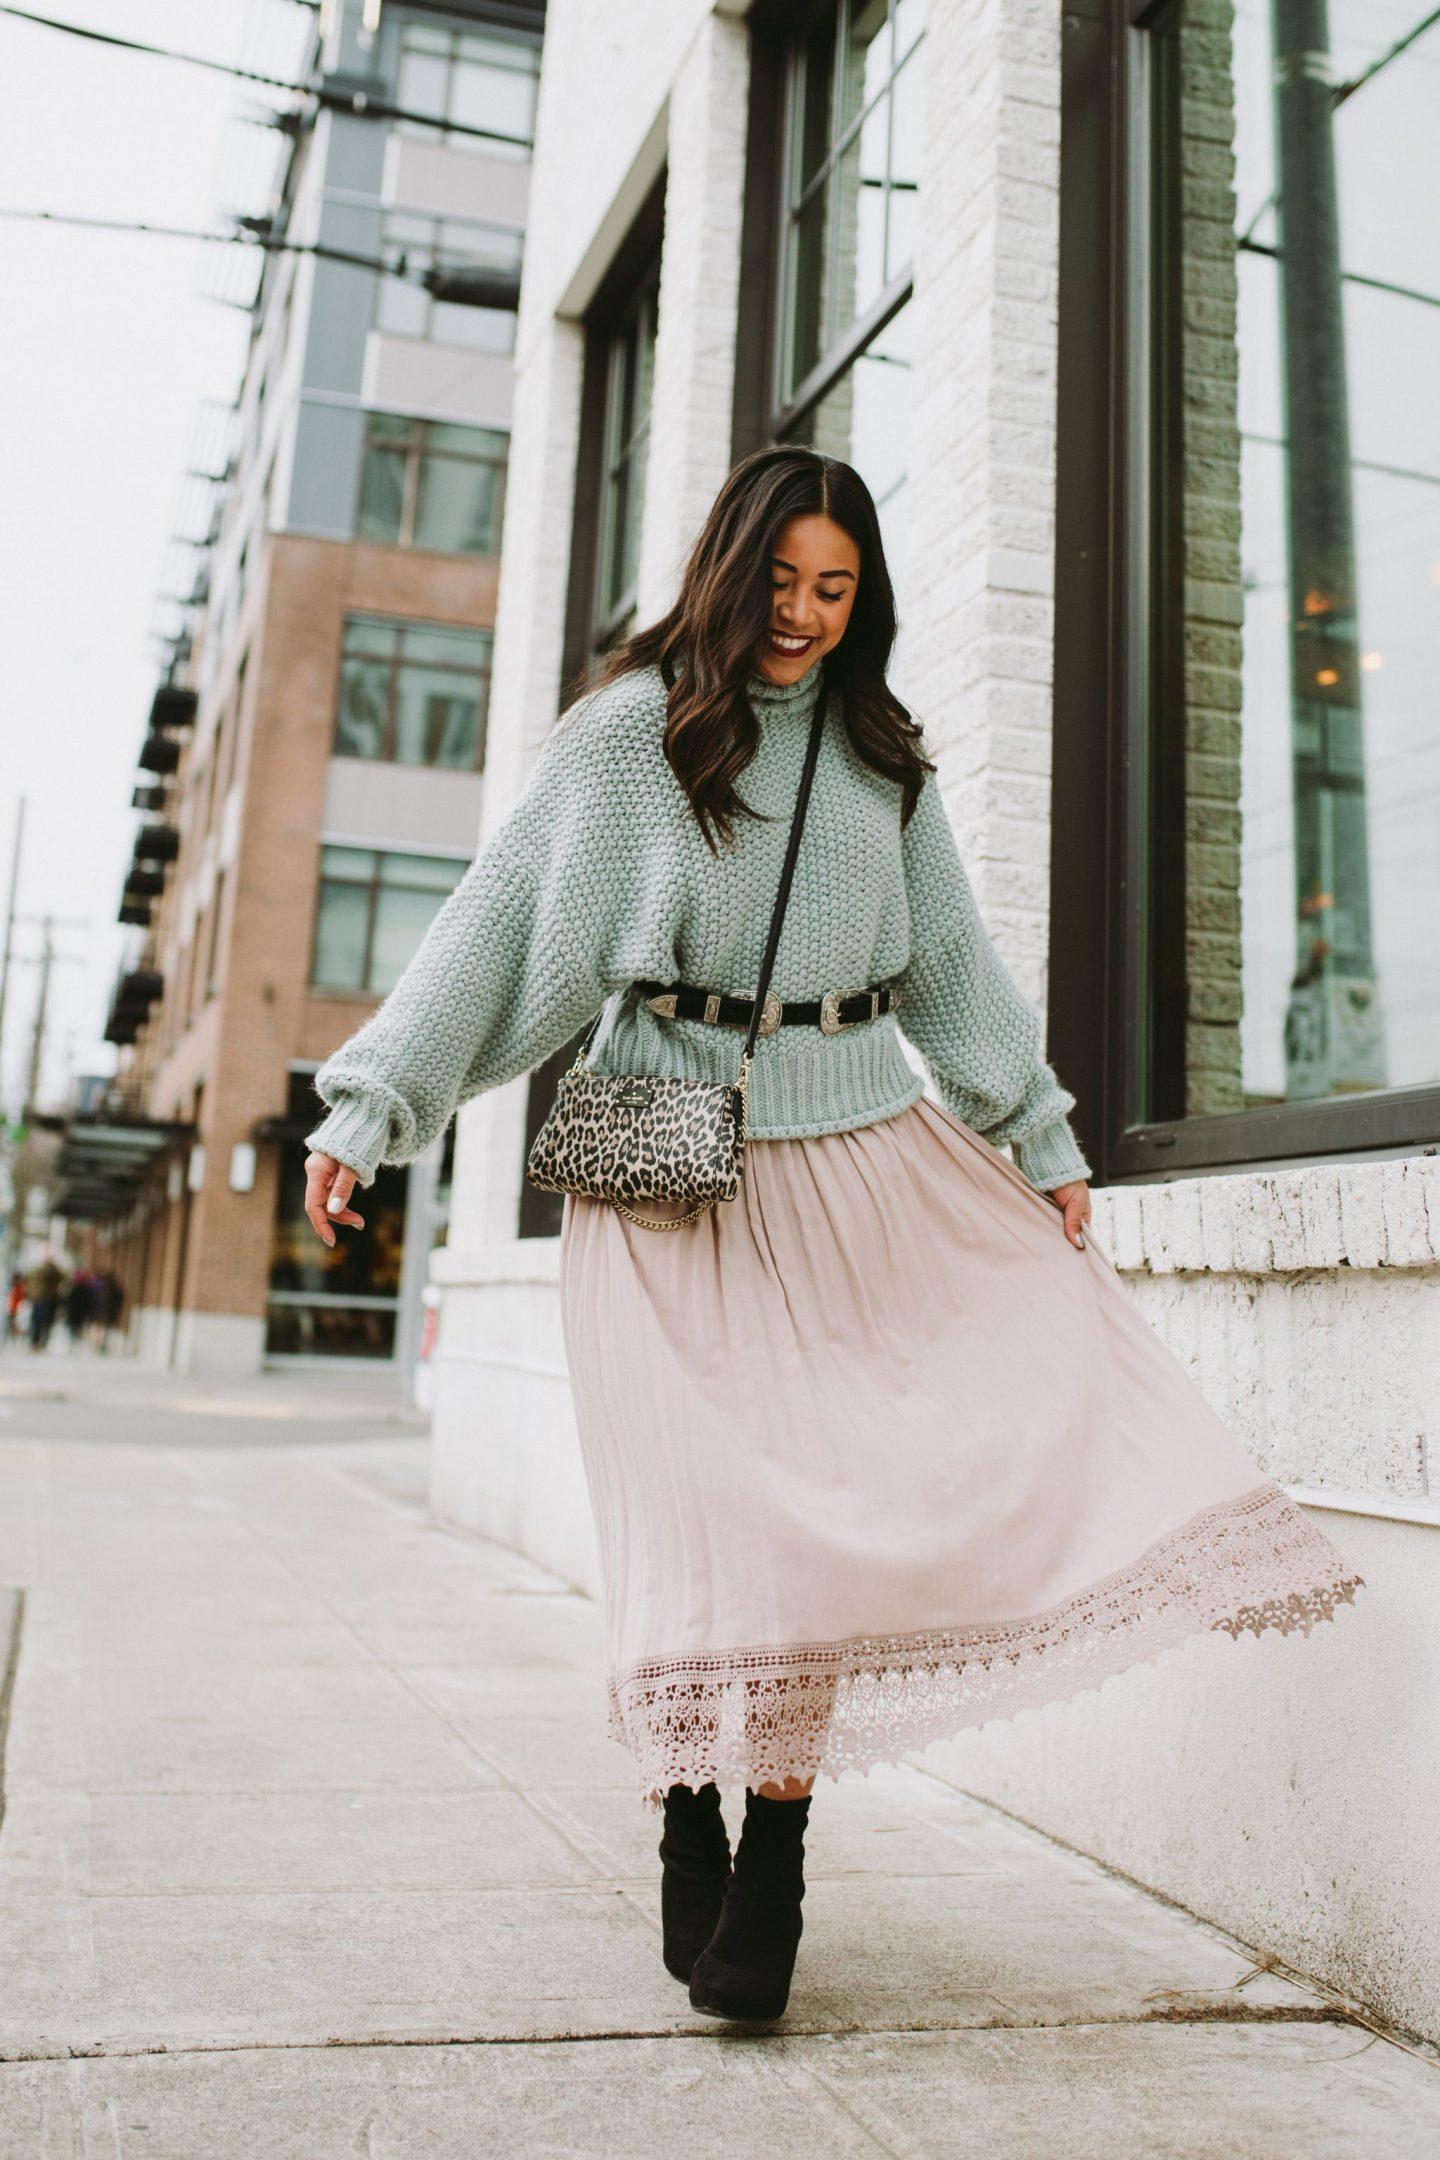 winter dress ideas